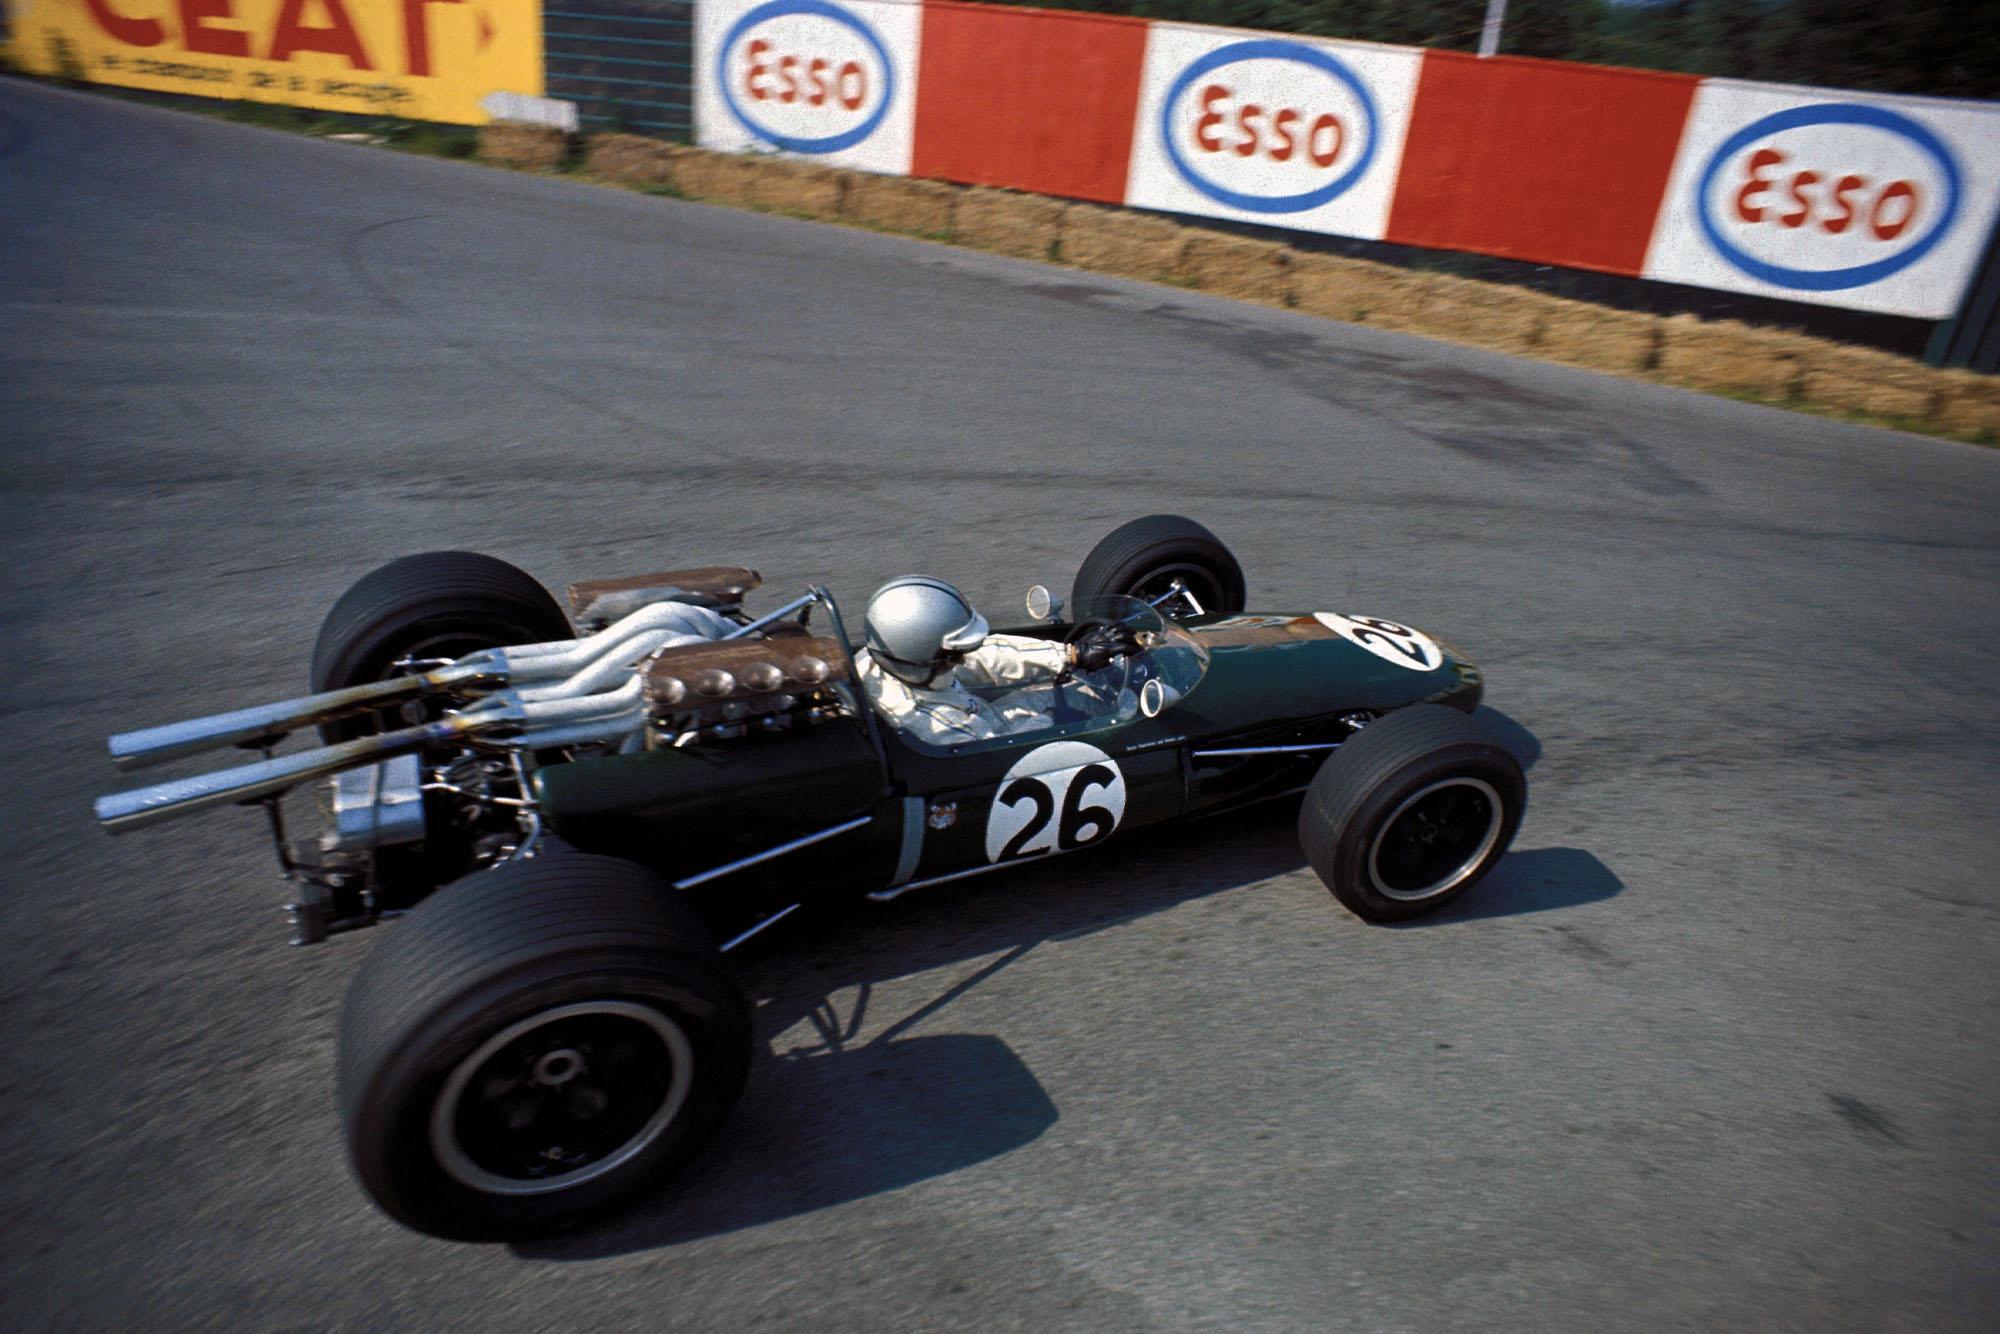 Jack Brabham (AUS) Brabham Repco BT24, retired on lap 16. Formula One World Championship, Rd4, Belgian Grand Prix, Spa Francorchamps, Belgium. 18 June 1967.